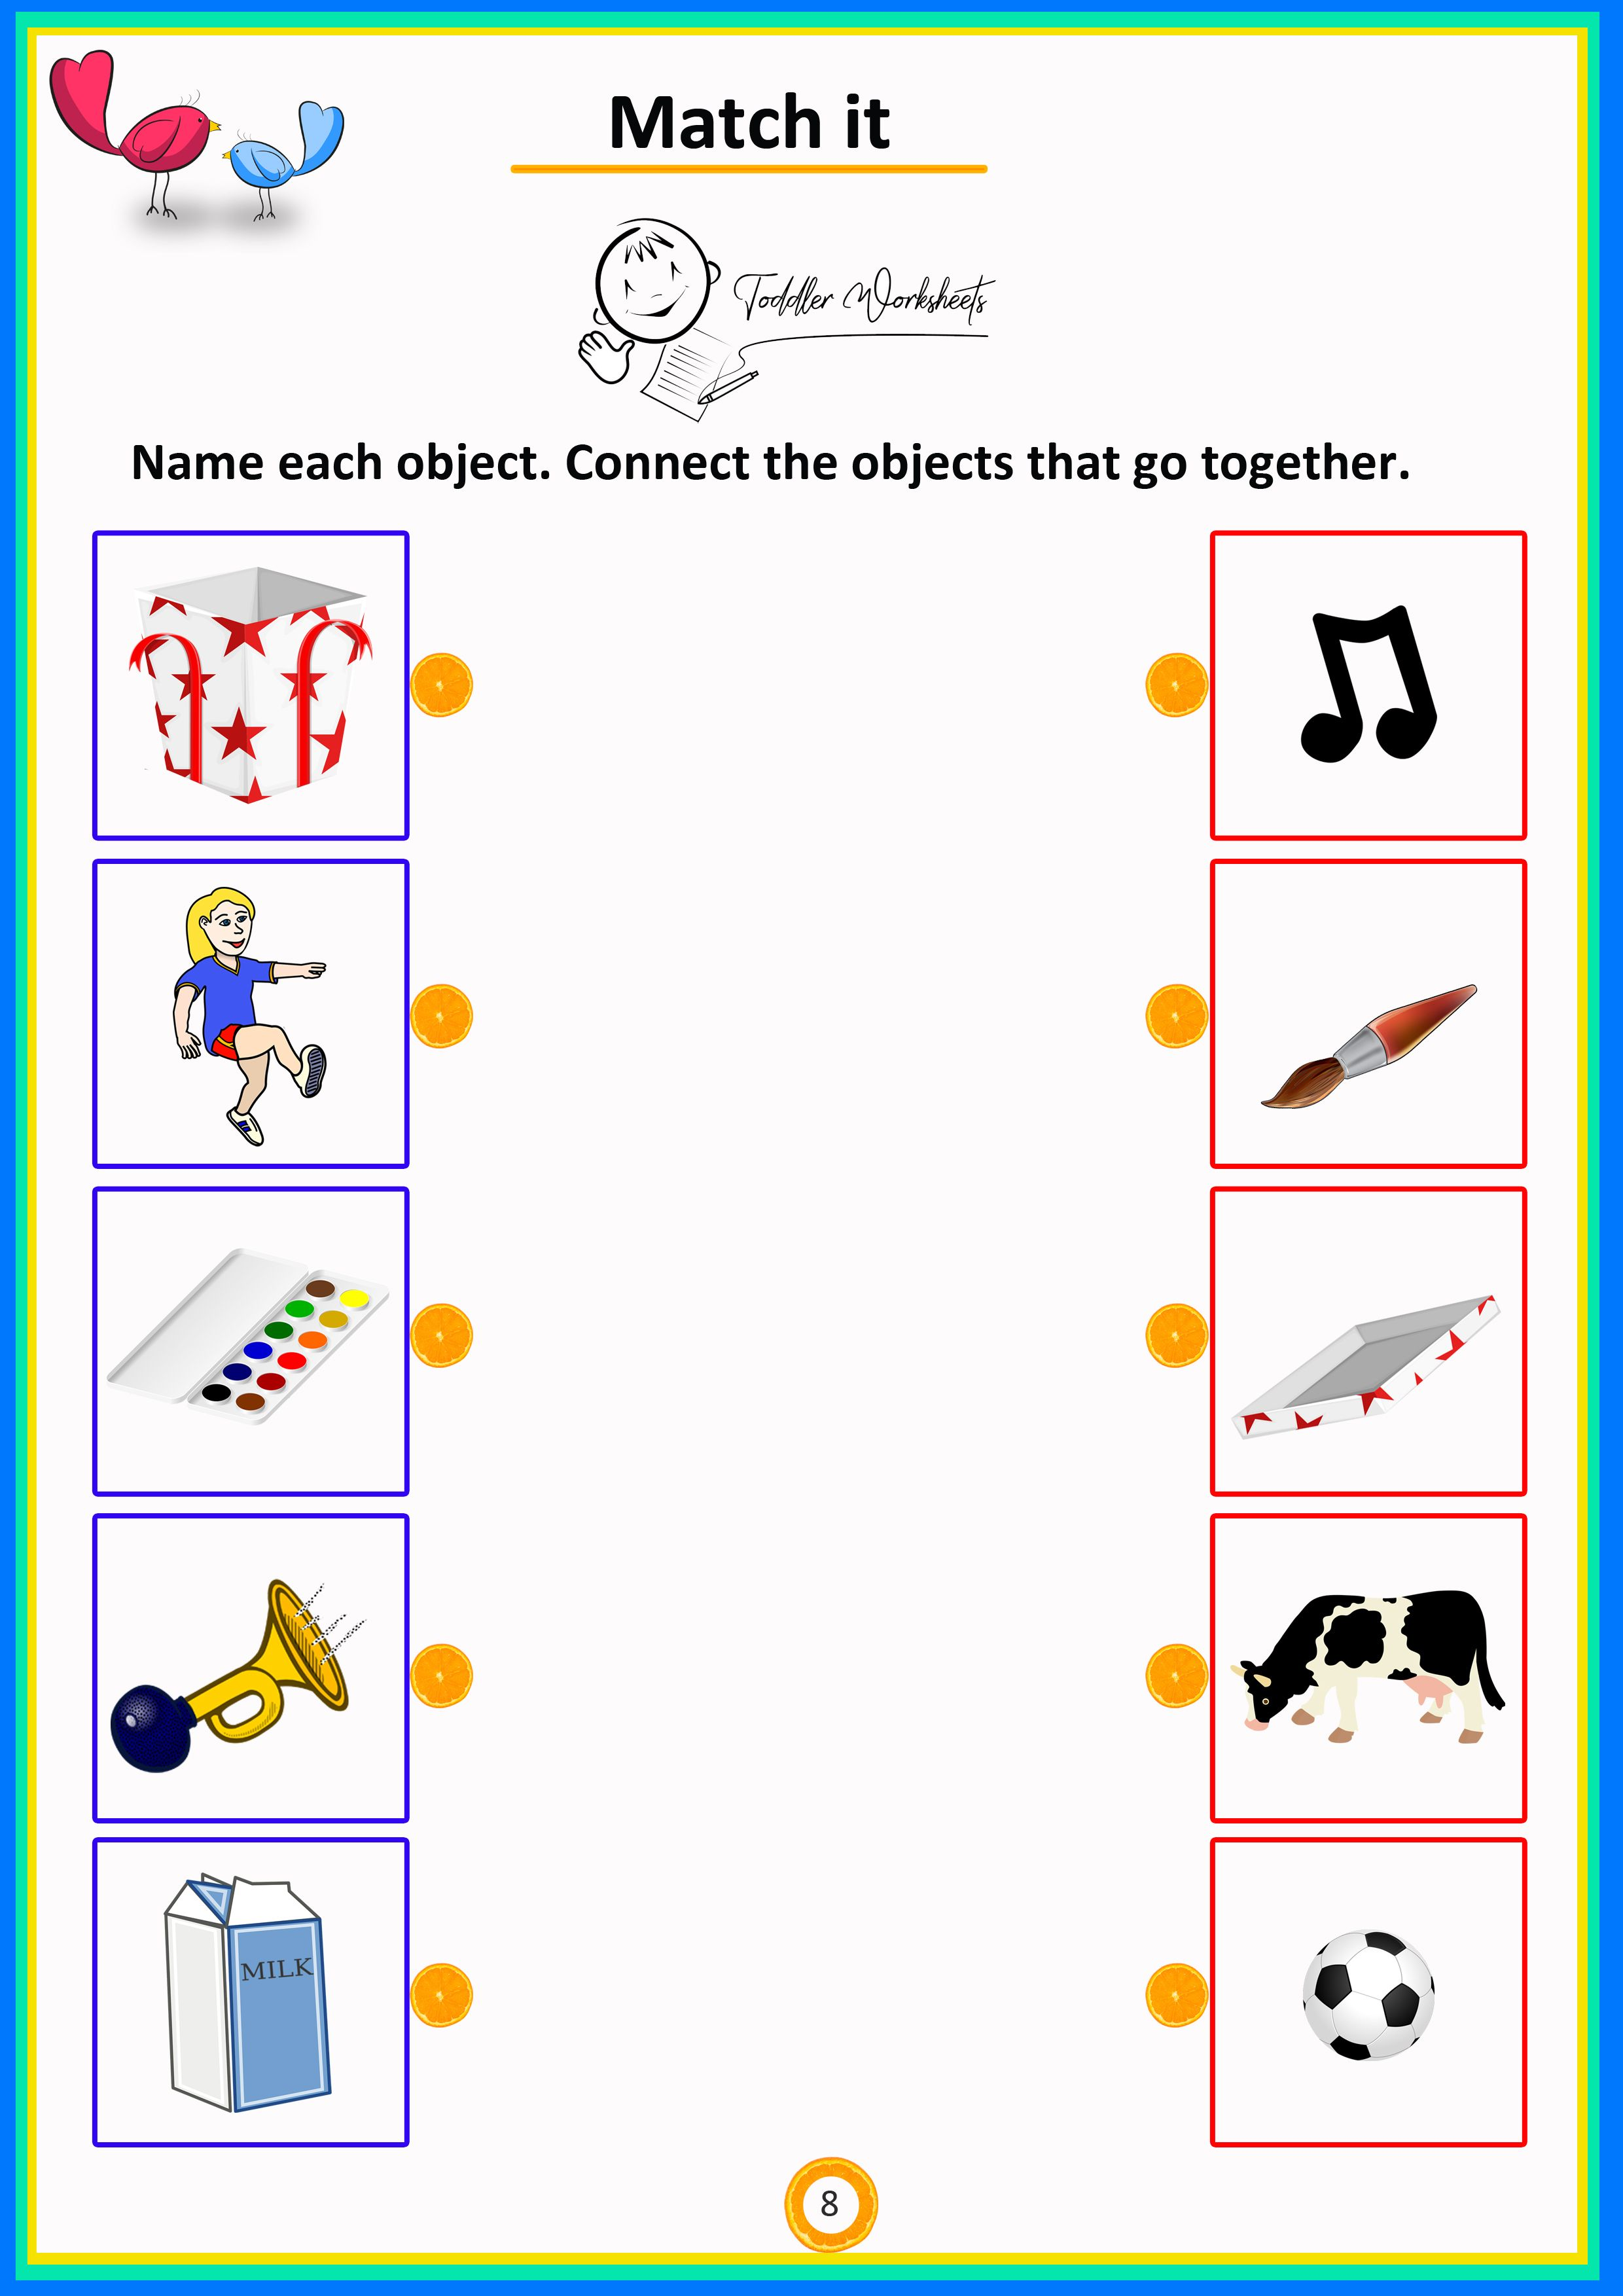 Okul Ncesi Sudoku Materials8 Logic Puzzles Math For Kids Ve